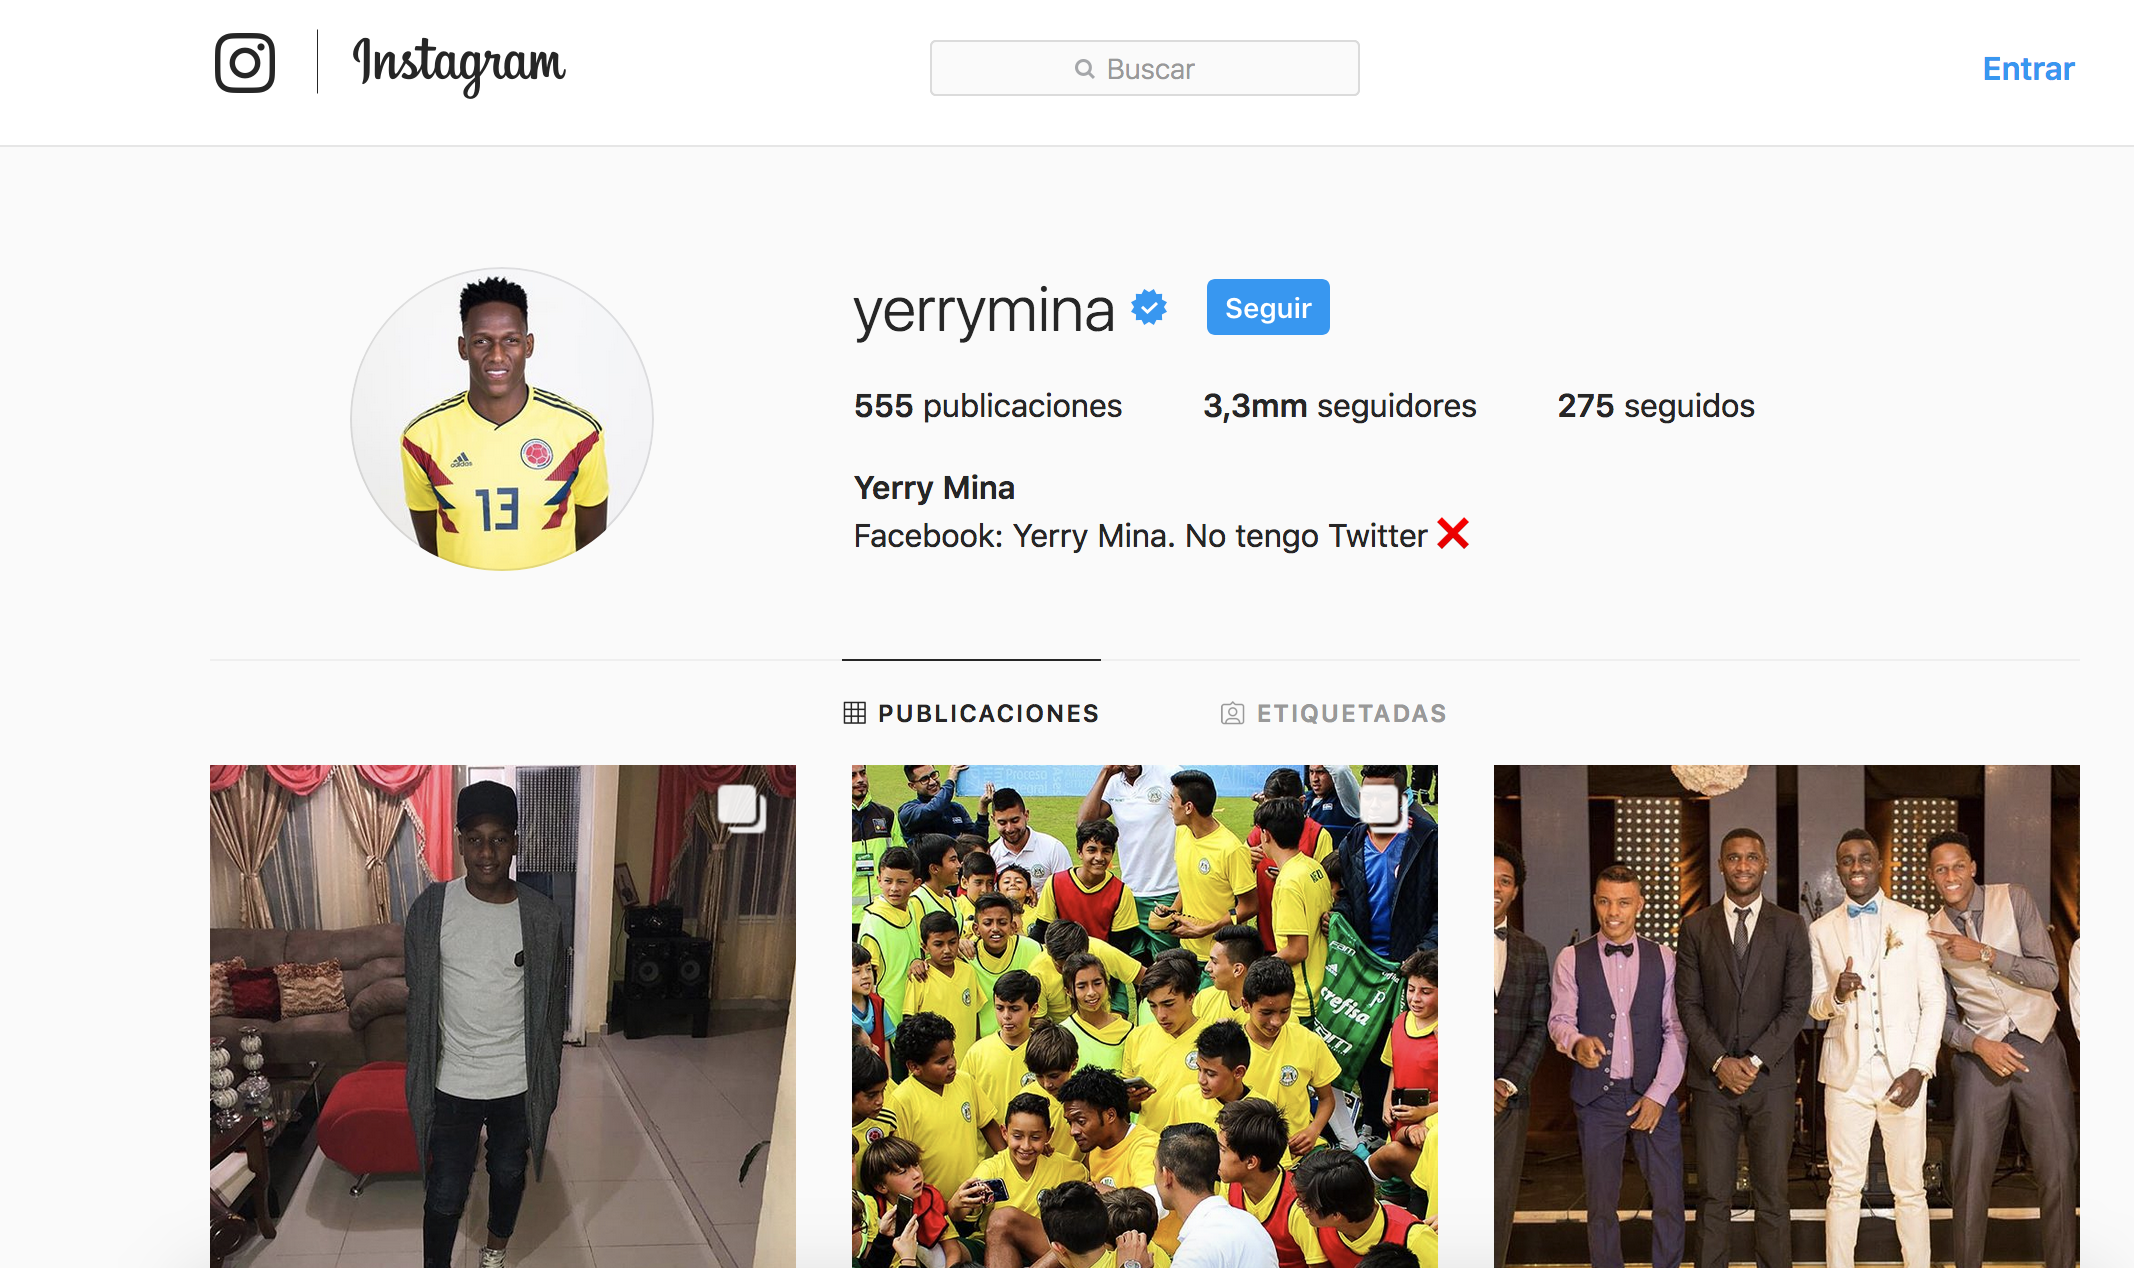 Yerry Mina Instagram